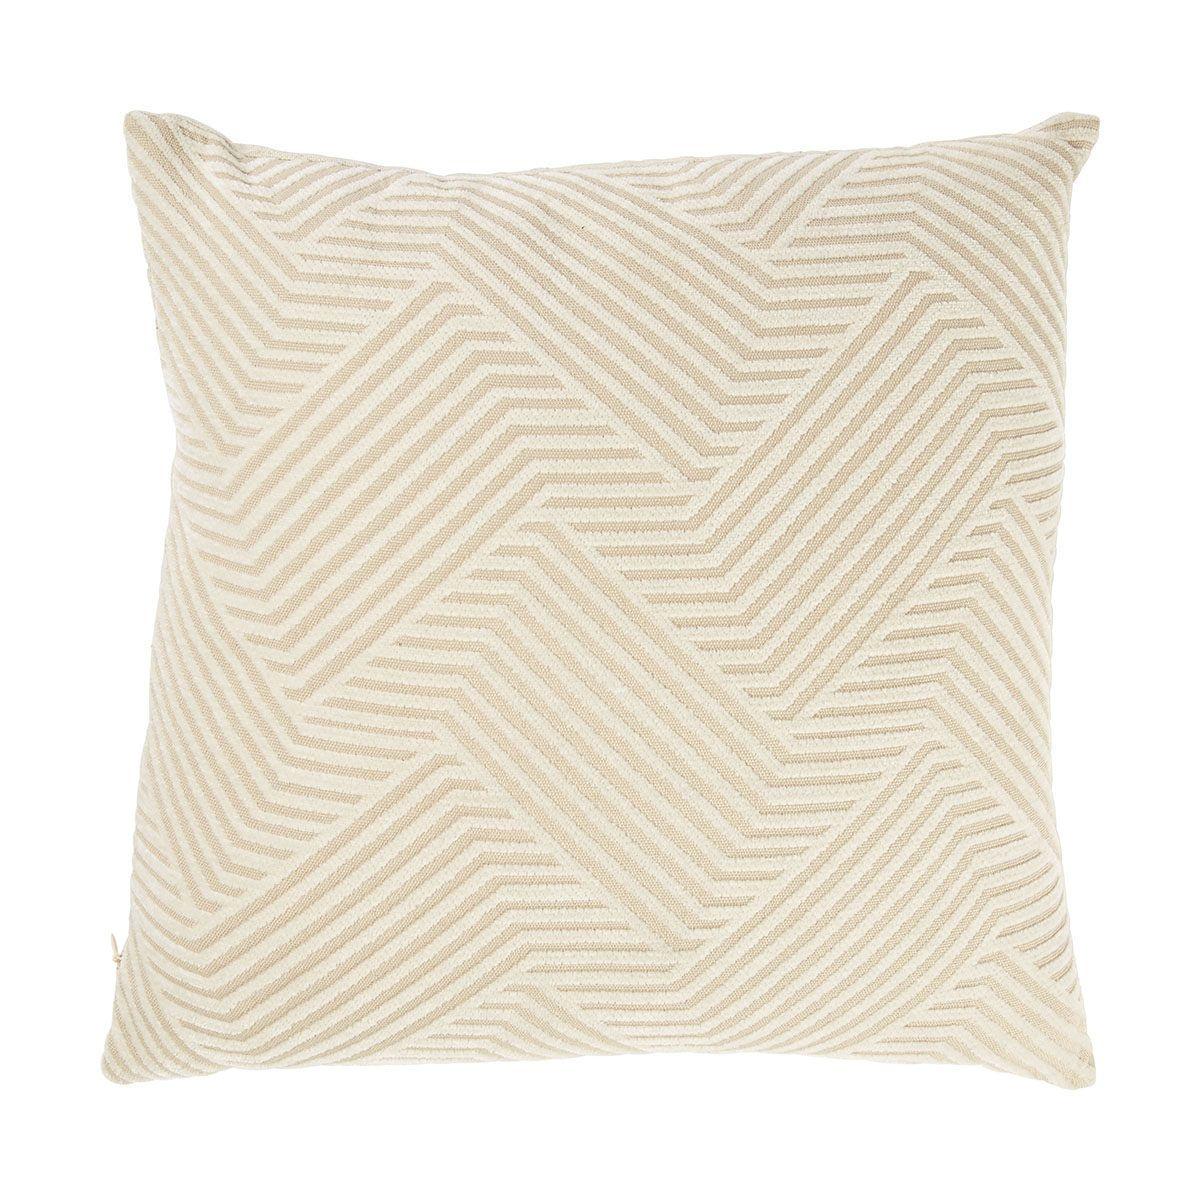 Chenille Cushion Geo, Creme Cushions, Sofa set